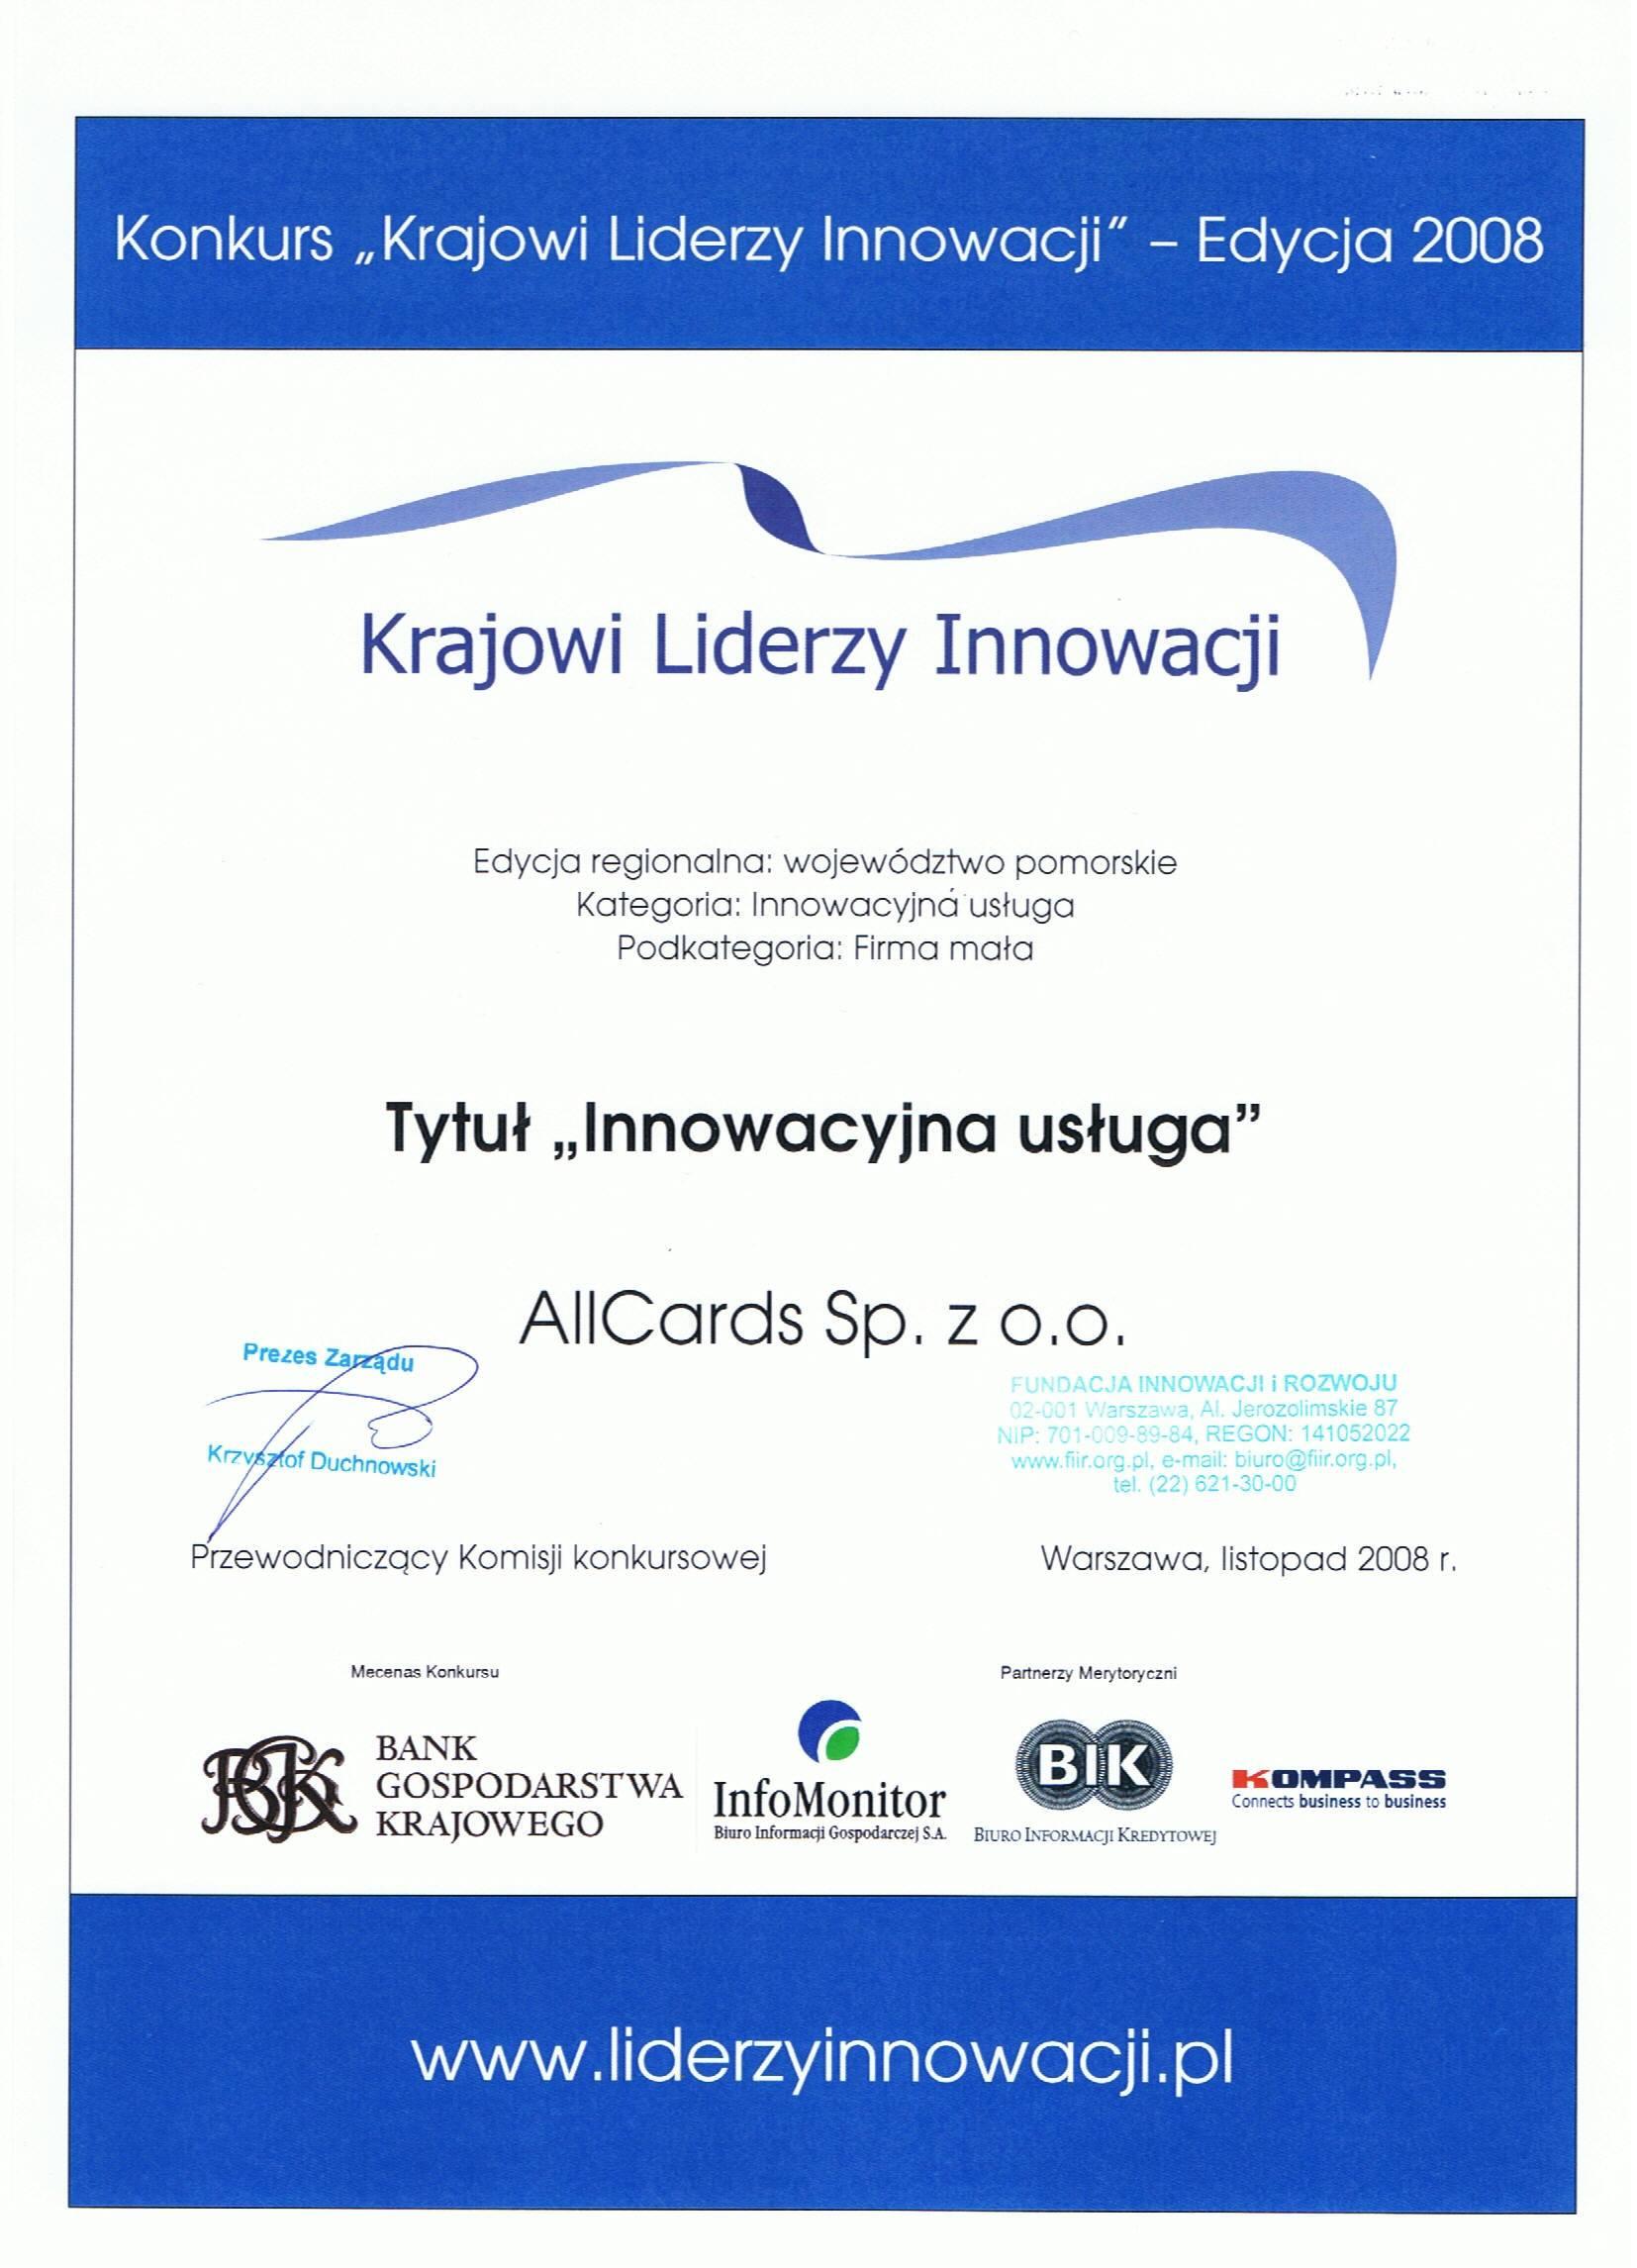 lider innowacji 2008